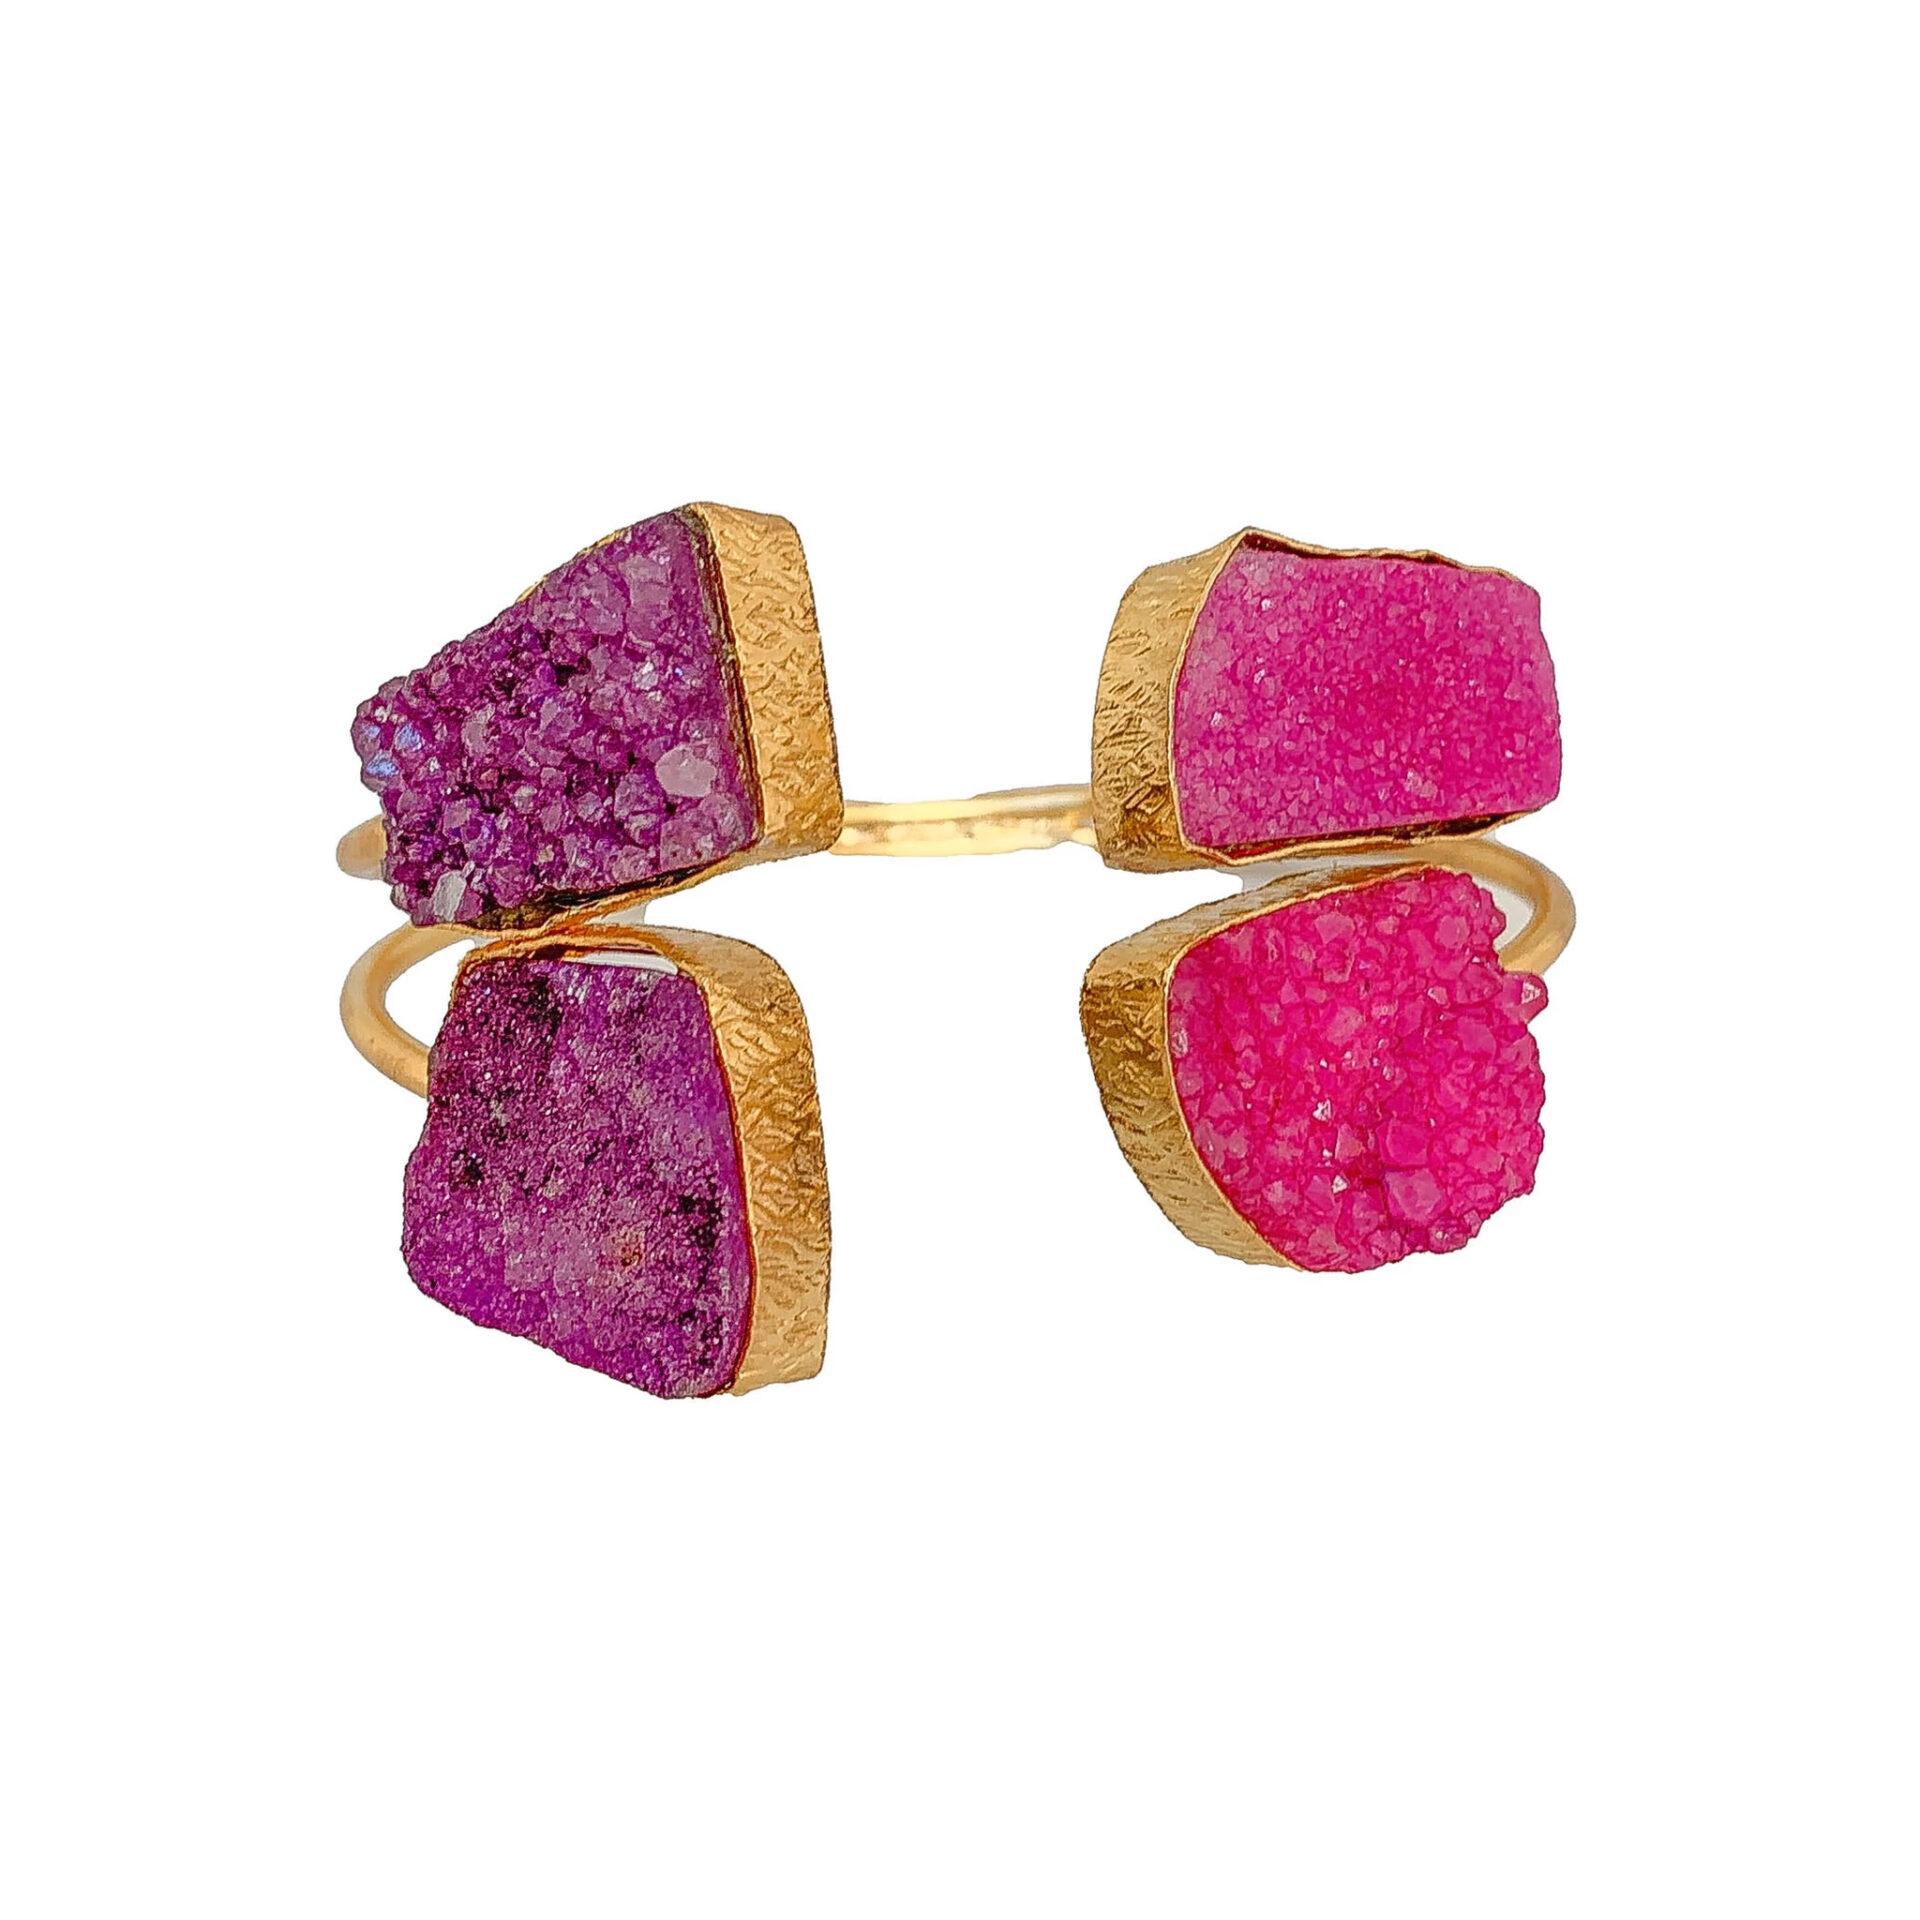 Tanya litkovska Women's Pink Crab Cuff Bracelet